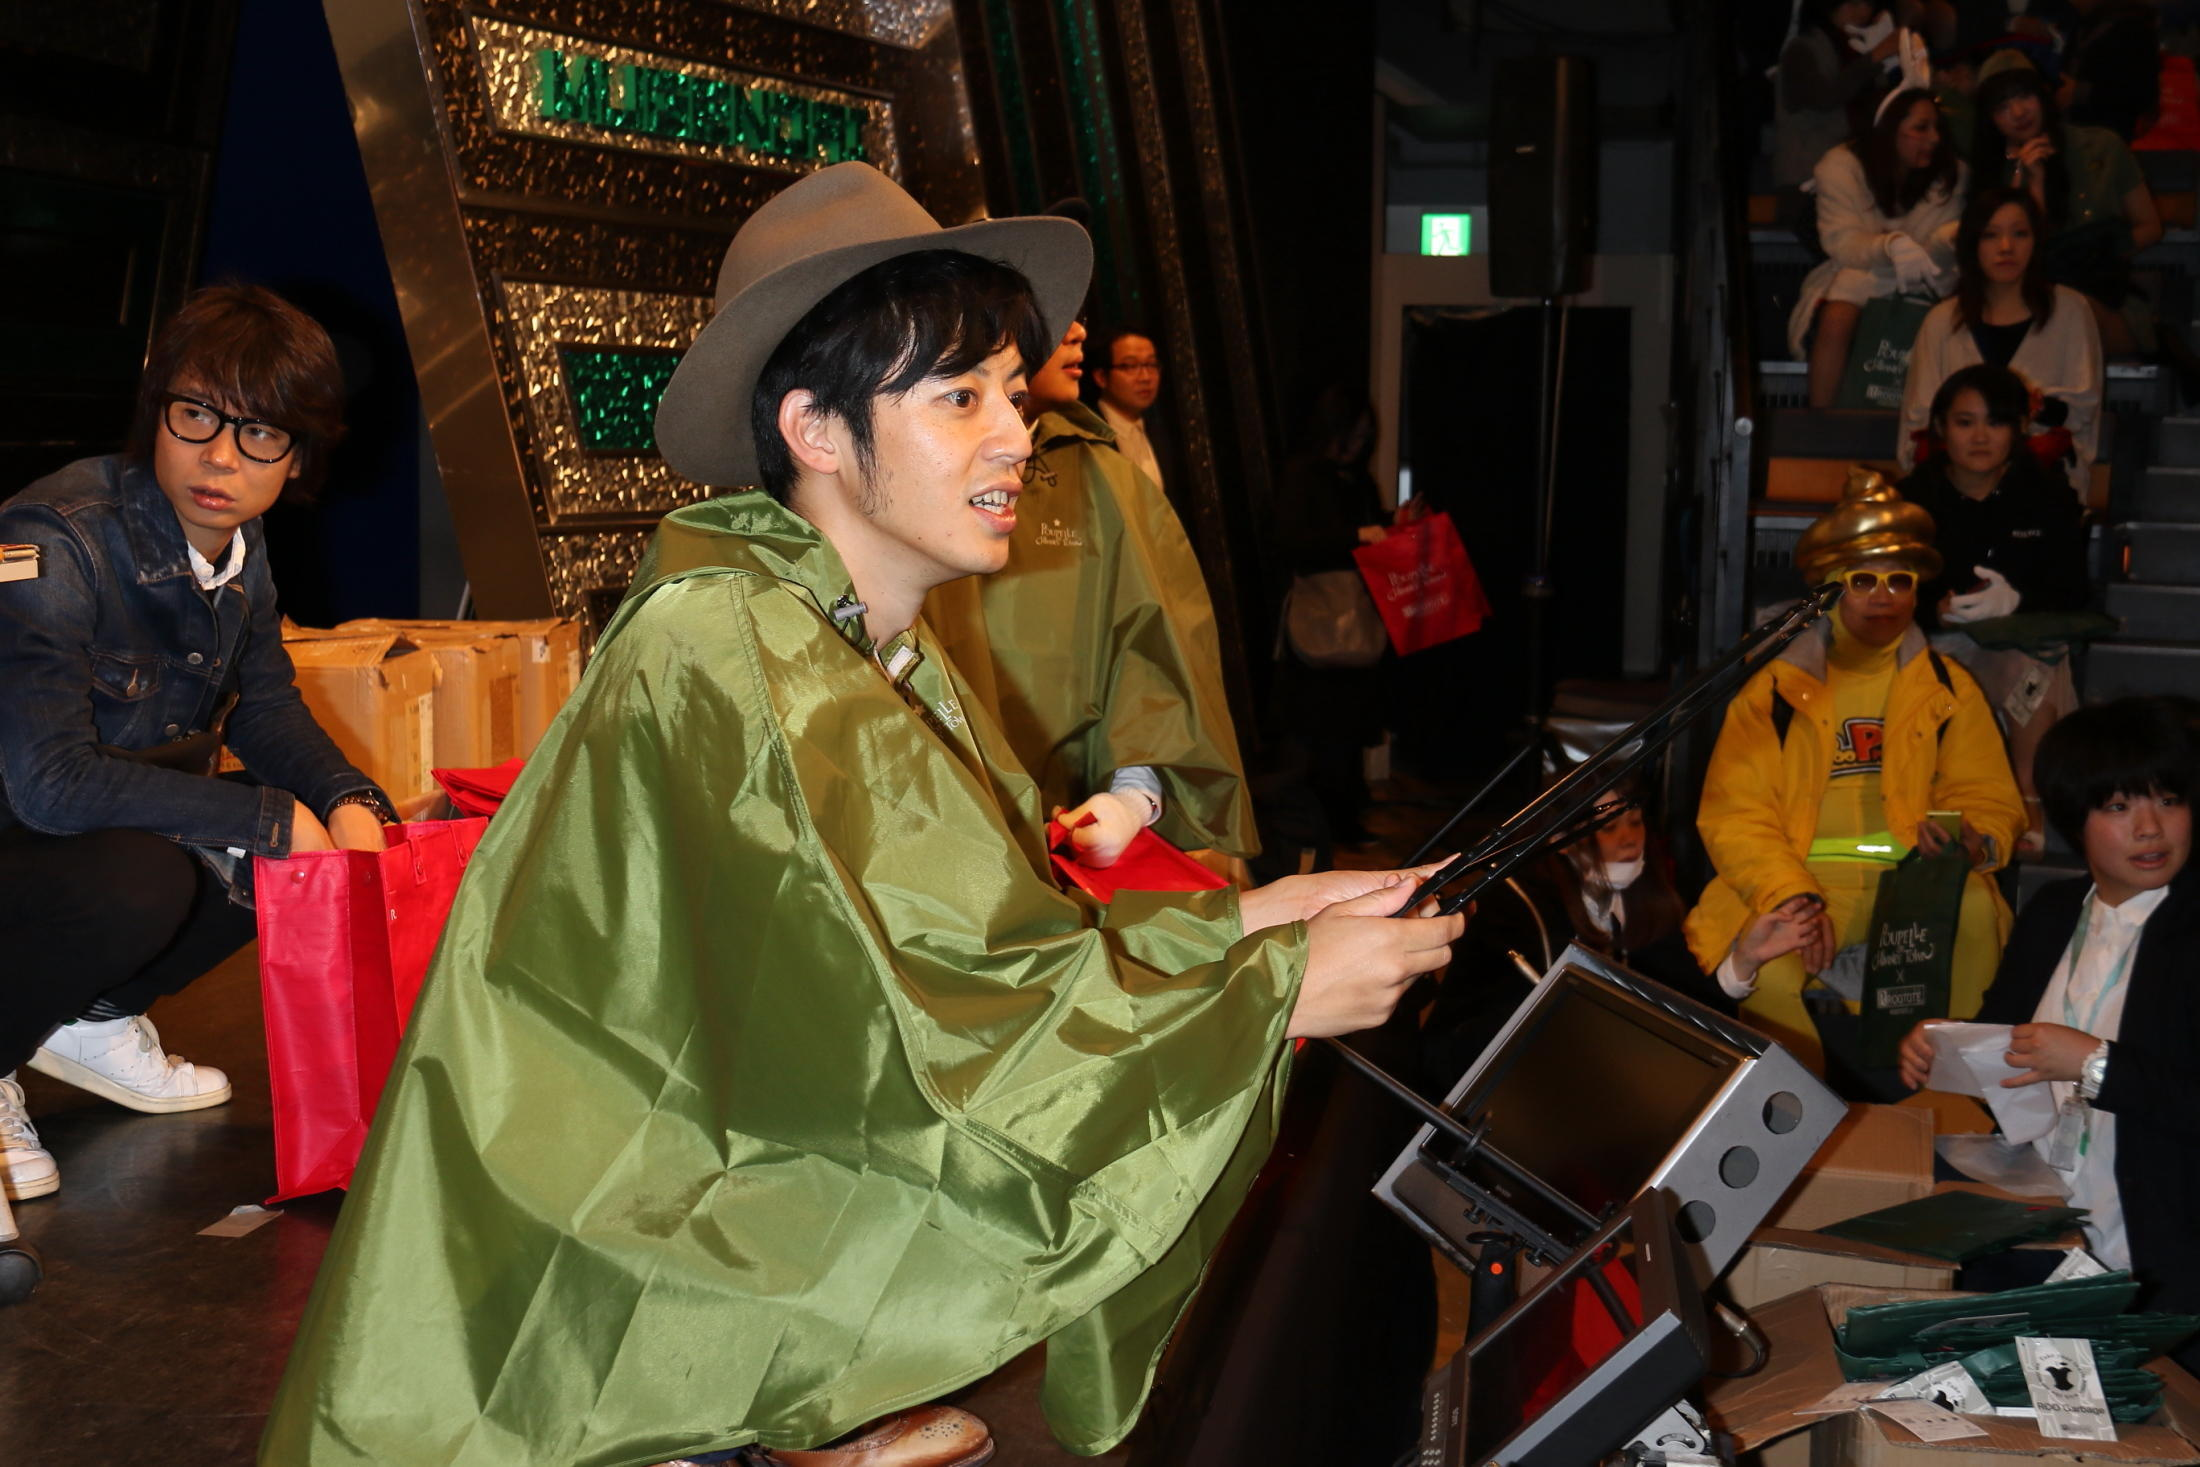 http://news.yoshimoto.co.jp/20161031084639-bb965349f6563d17eafa7167078efcf4293e92cd.jpg